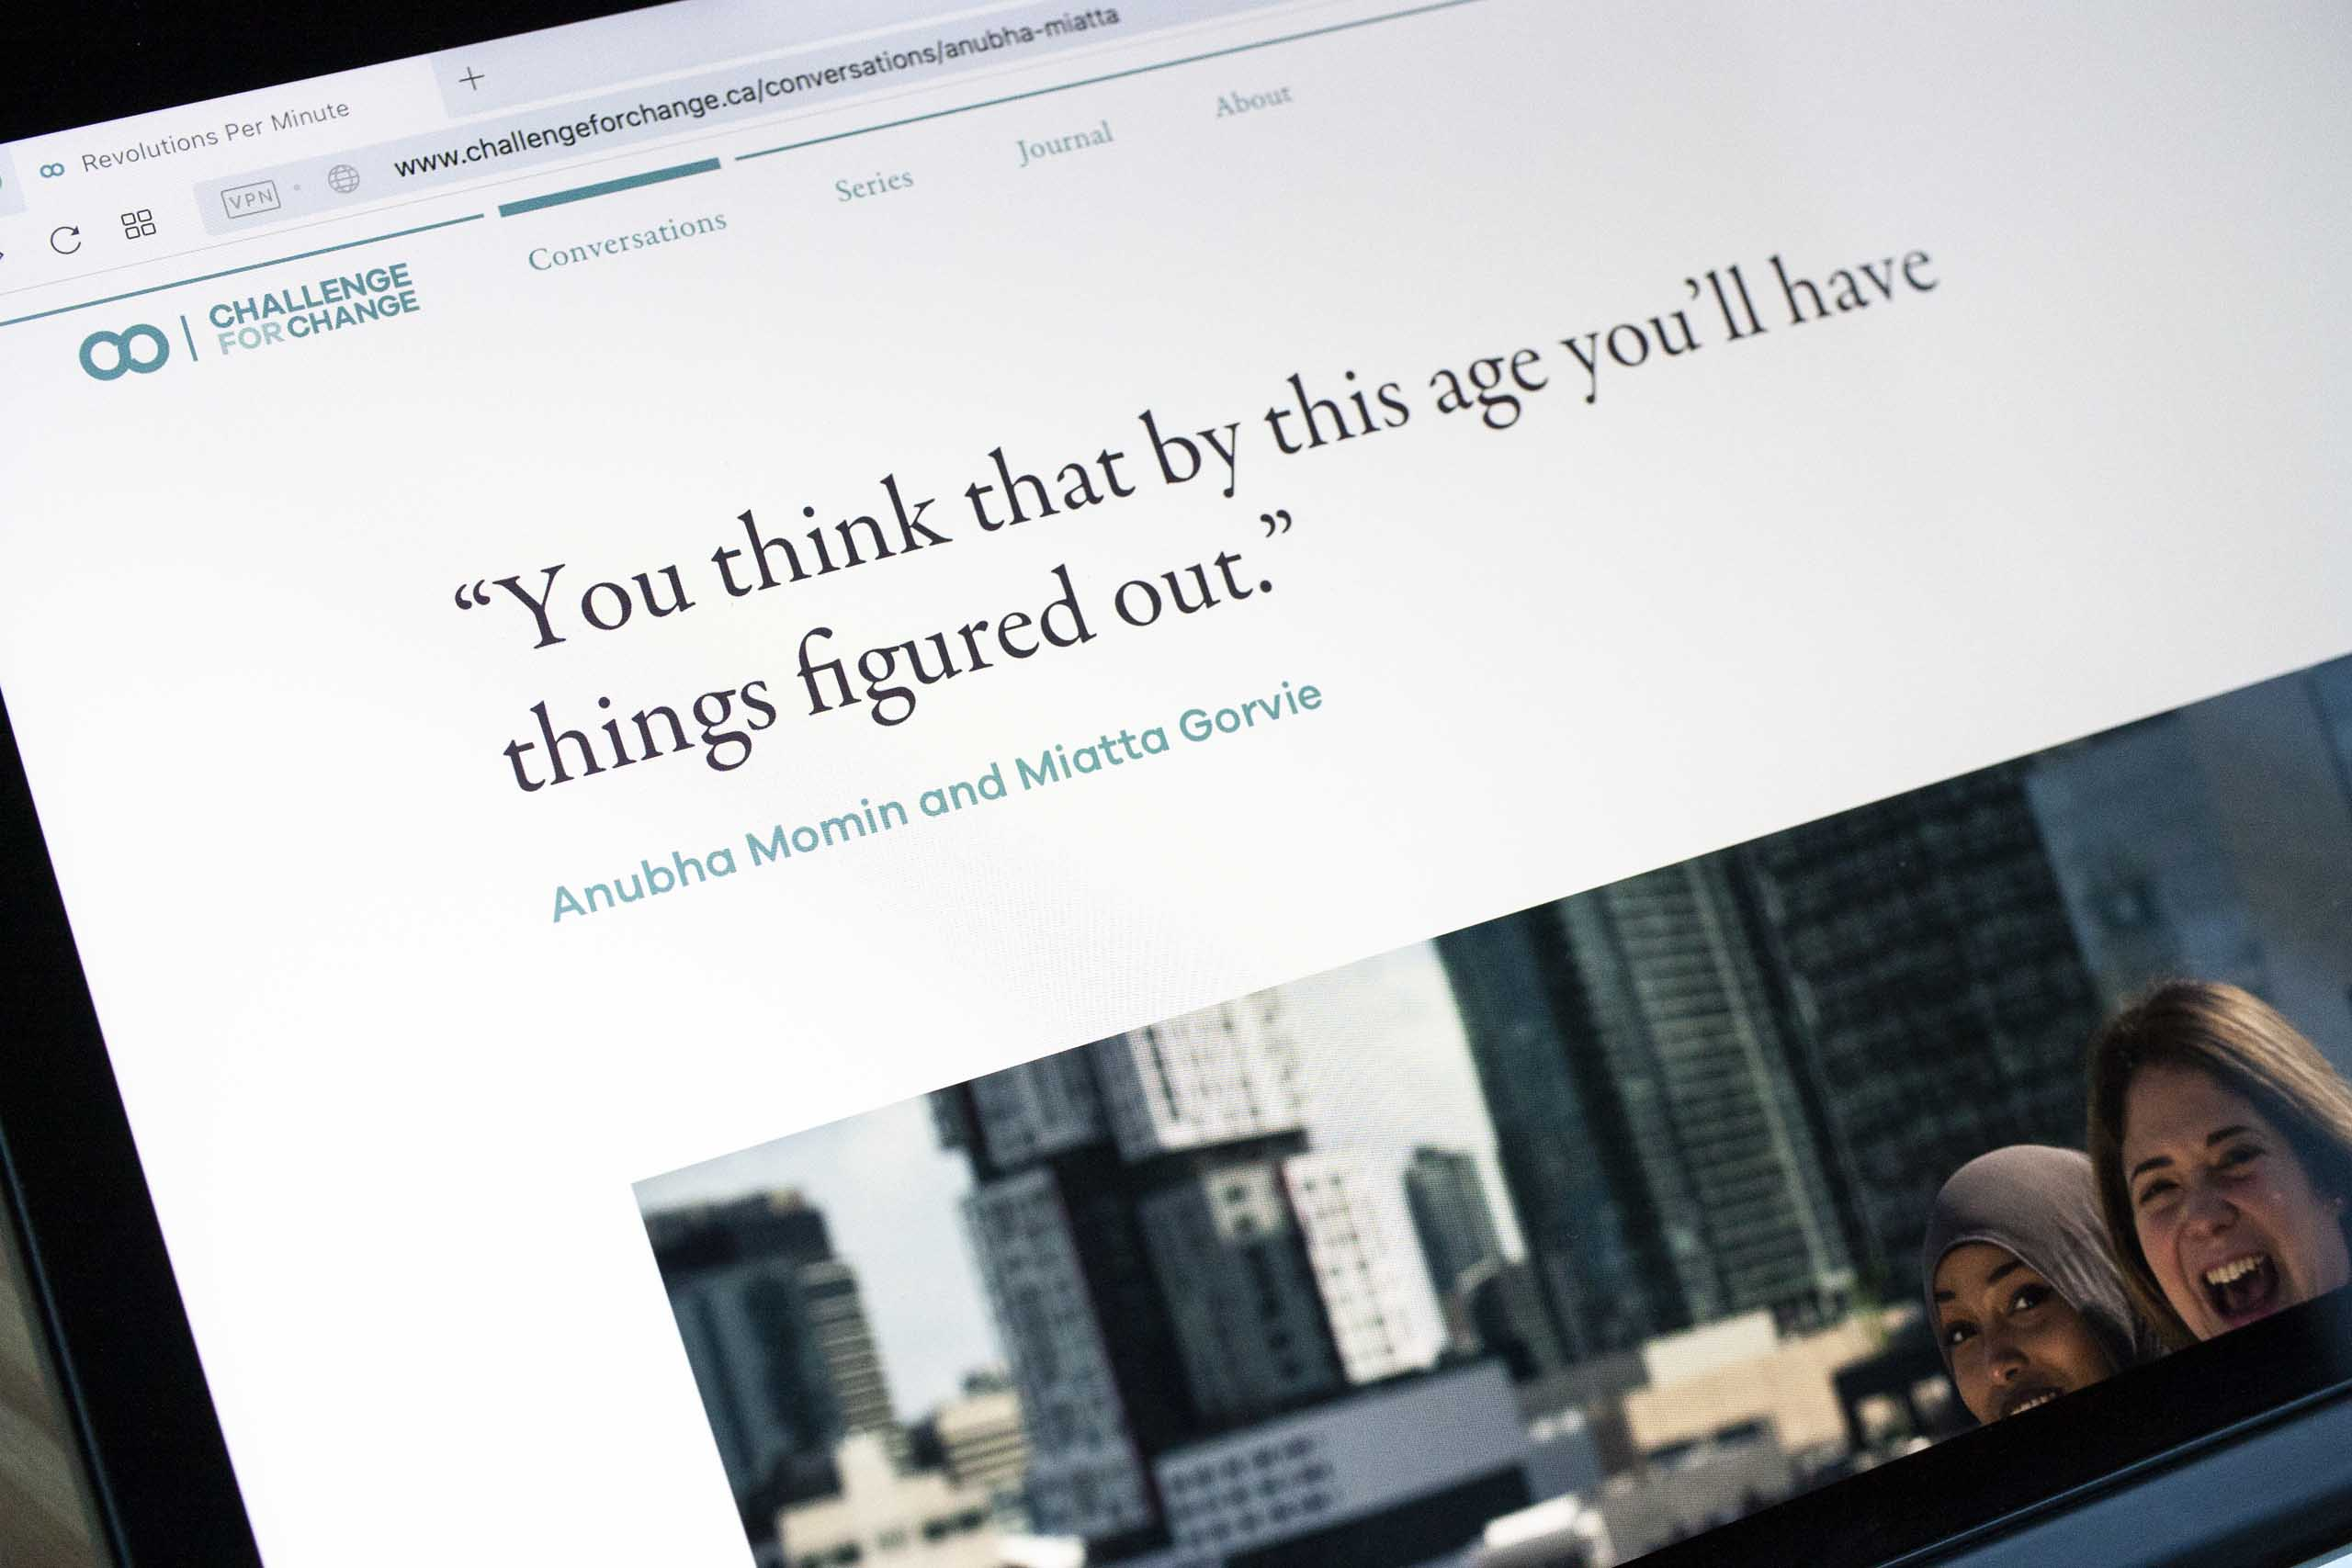 Headline for a conversation set in Garamond Premiere typeface showcasing the digital application of fi ligature — by Yagnyuk.